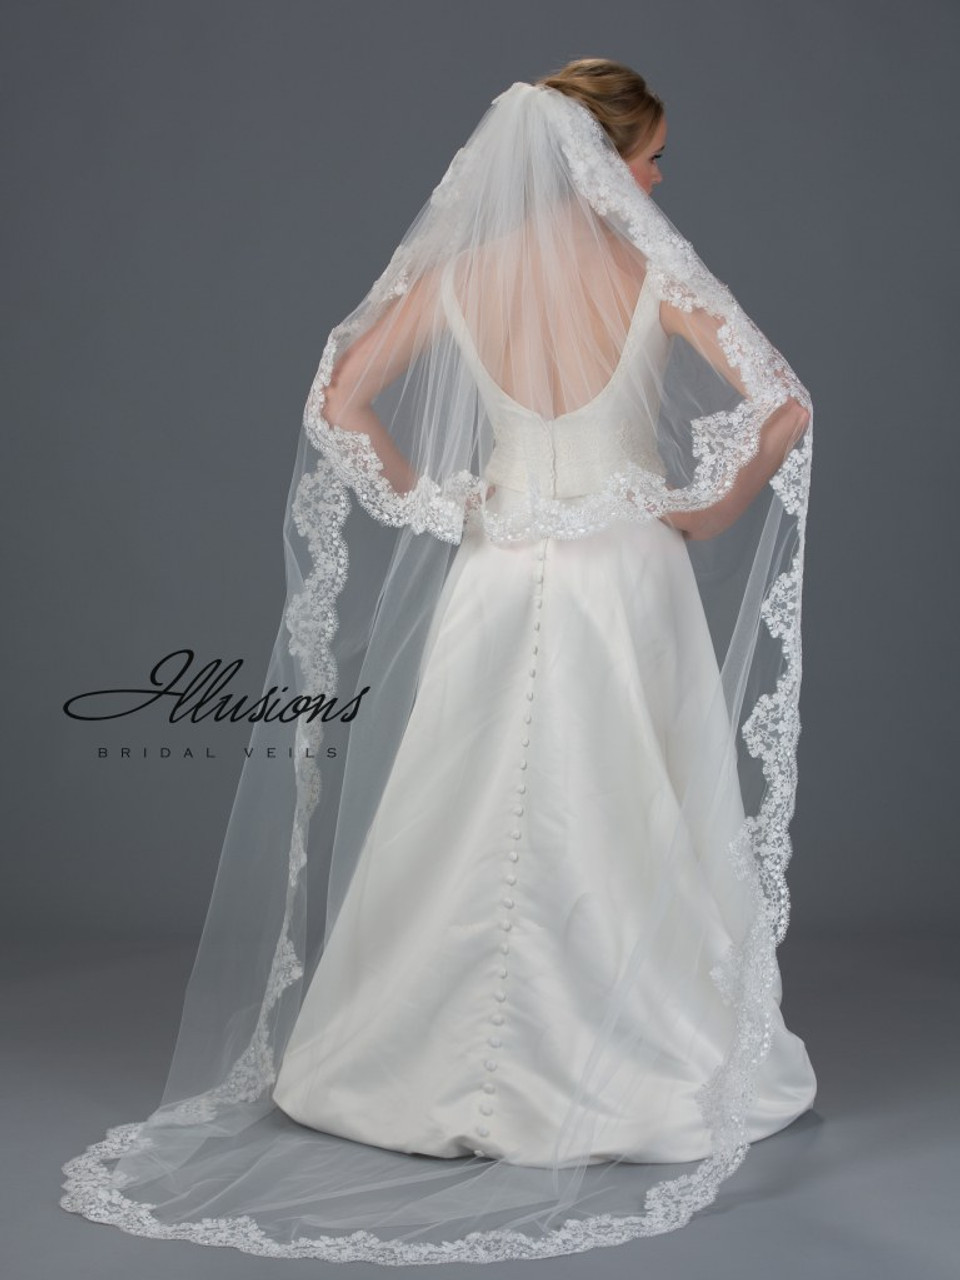 Illusions Bridal Veils Style S7-902-13L - 2 Layer Circle Cut Chapel Lace Edge